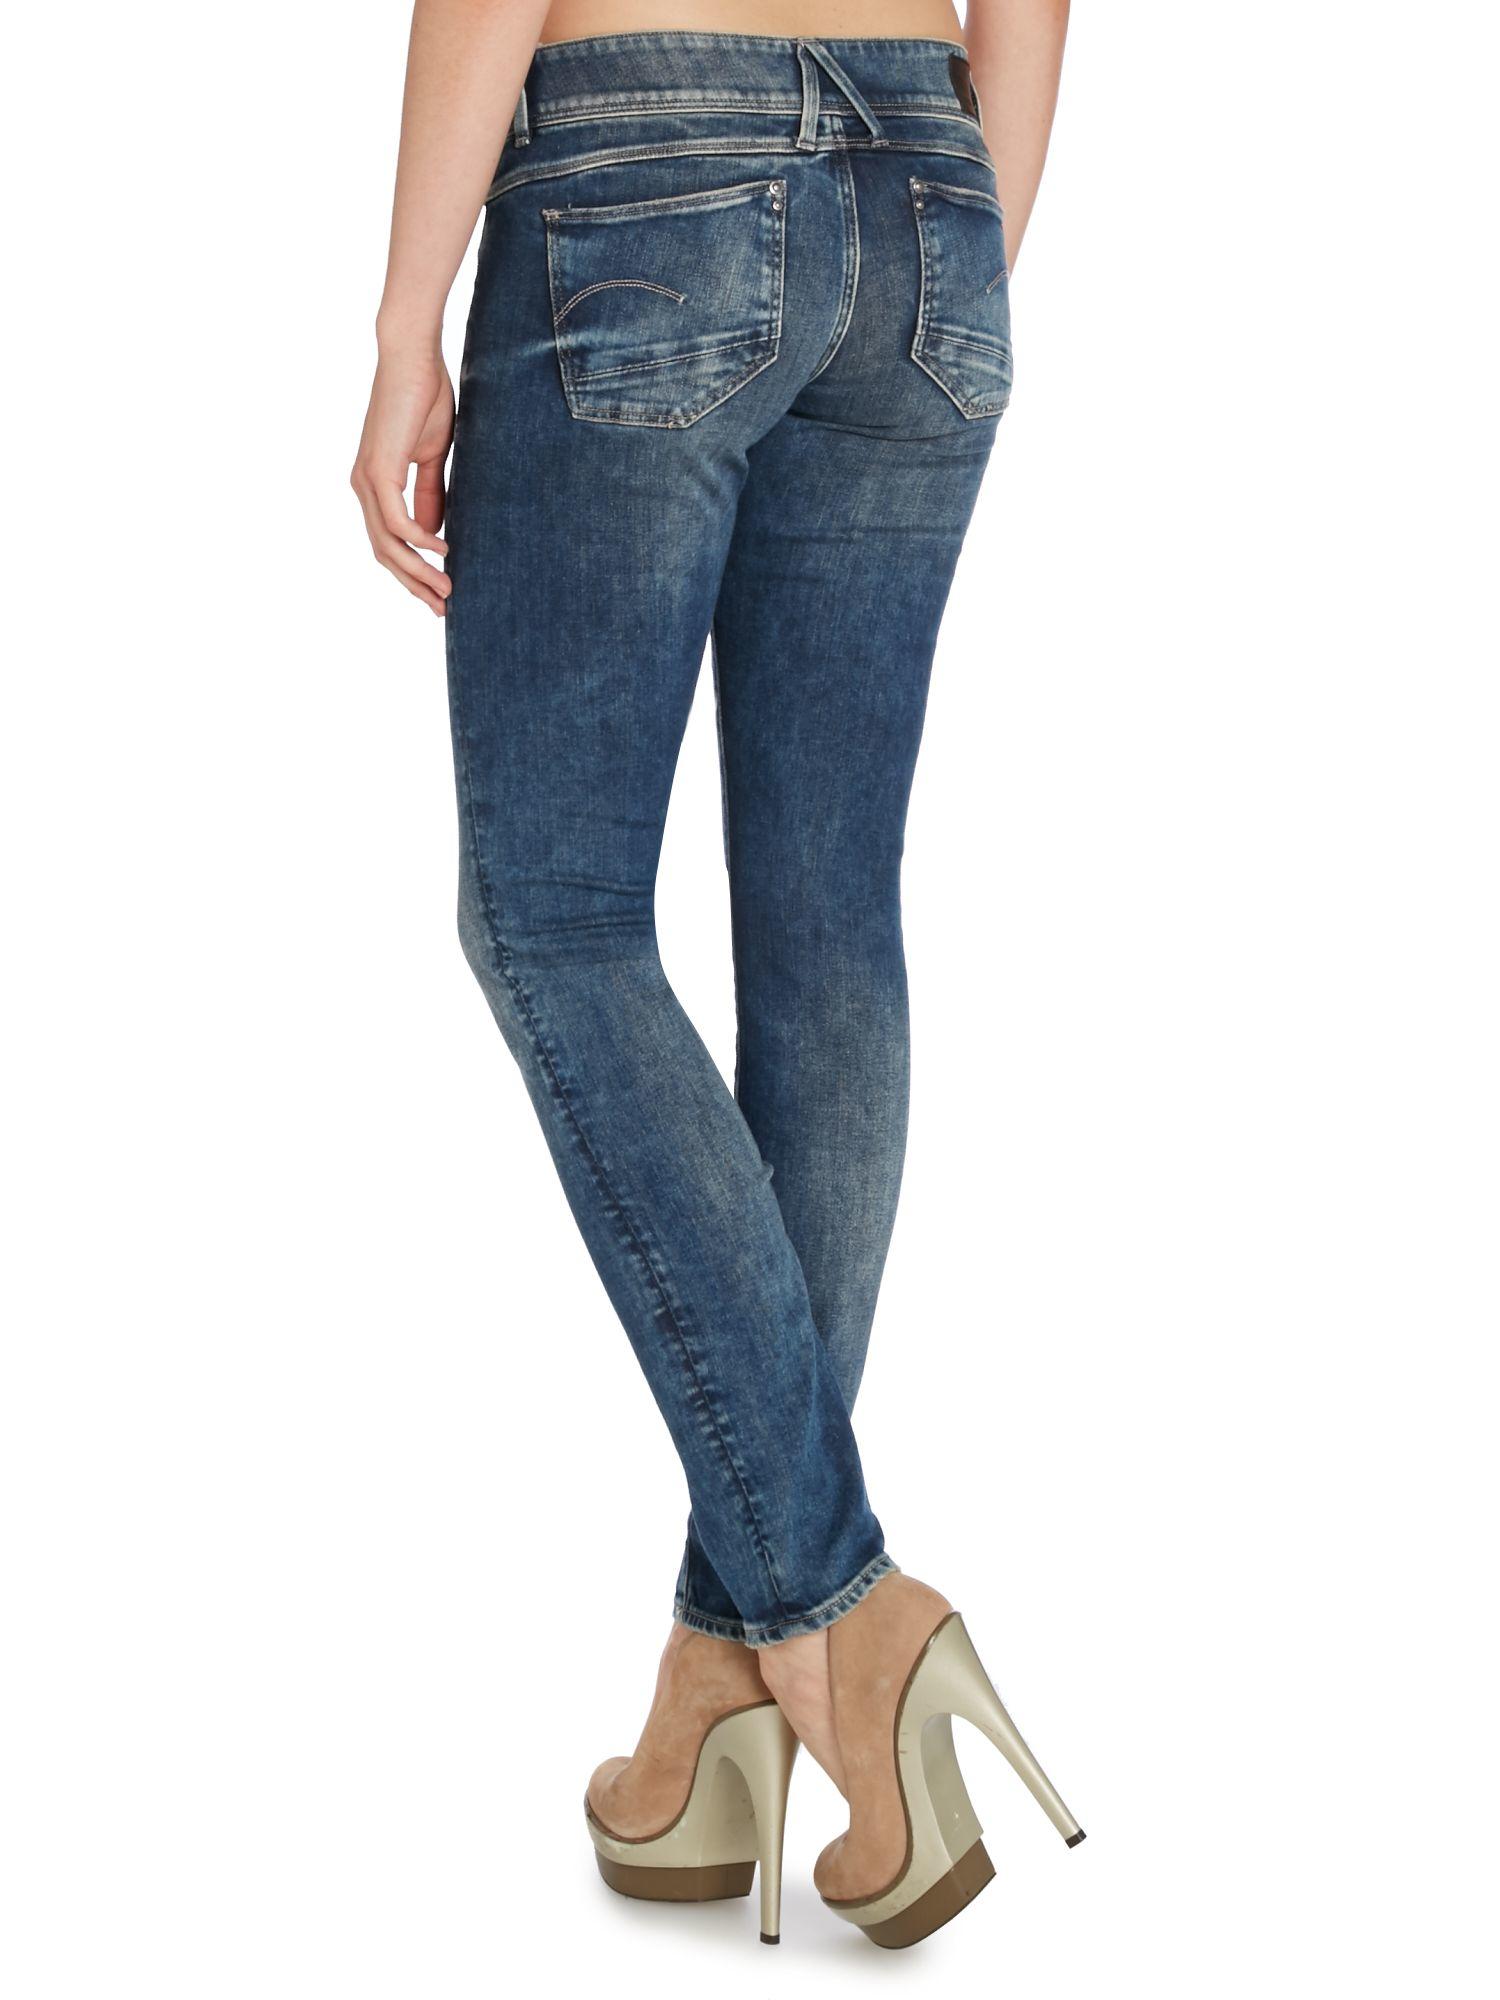 g star raw lynn mid skinny jean in malk denim in blue lyst. Black Bedroom Furniture Sets. Home Design Ideas